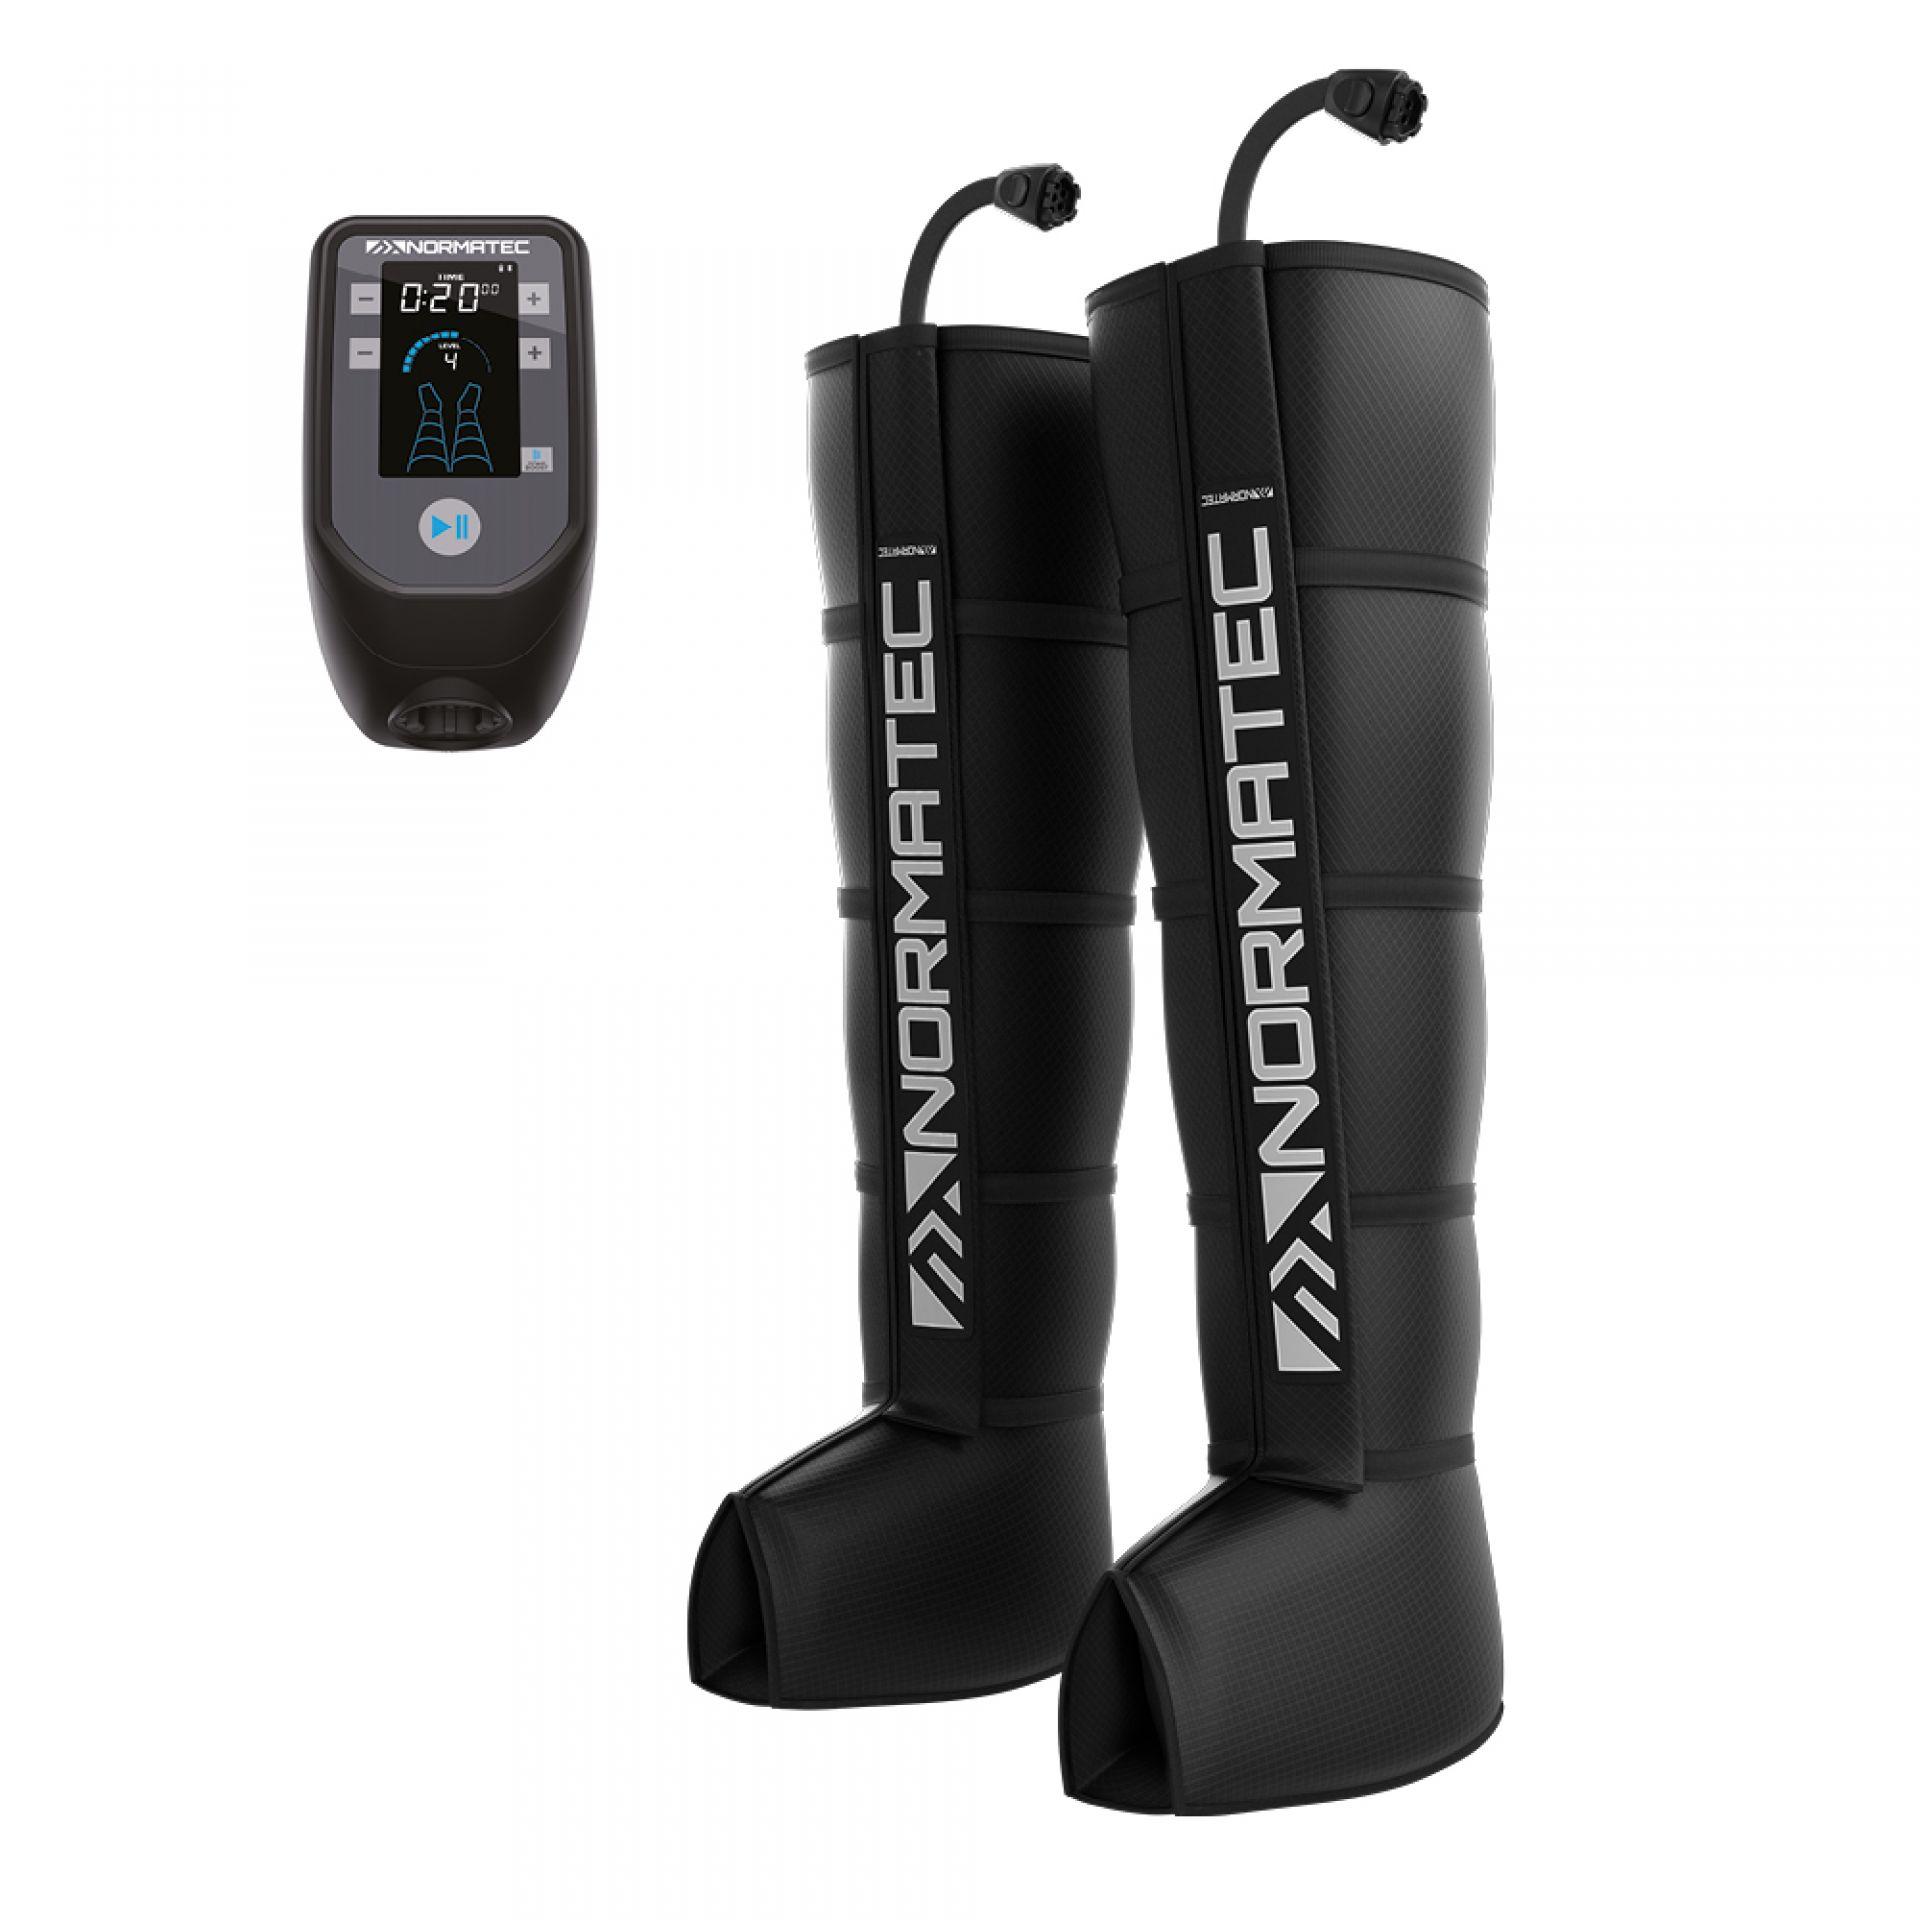 NormaTec 2.0 Leg Power Boot